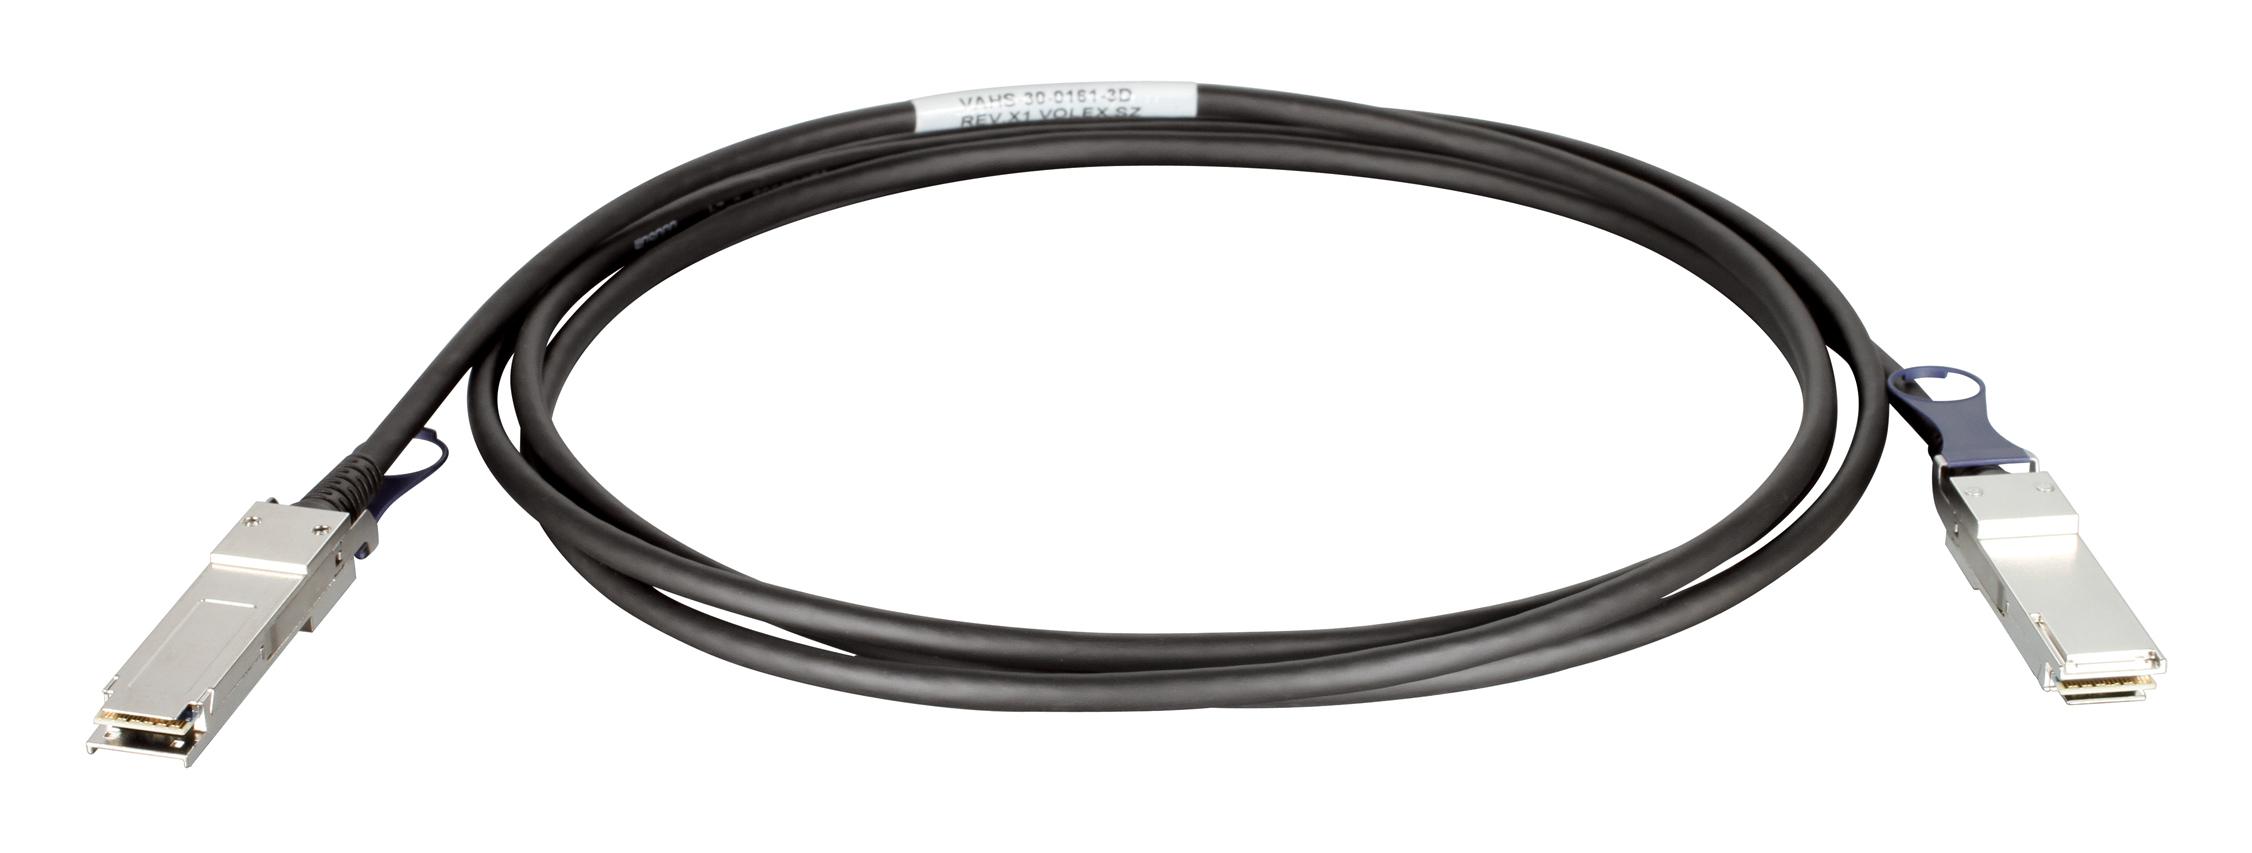 D-Link QSFP+, 3m 3m QSFP+ QSFP+ Nero cavo InfiniBand